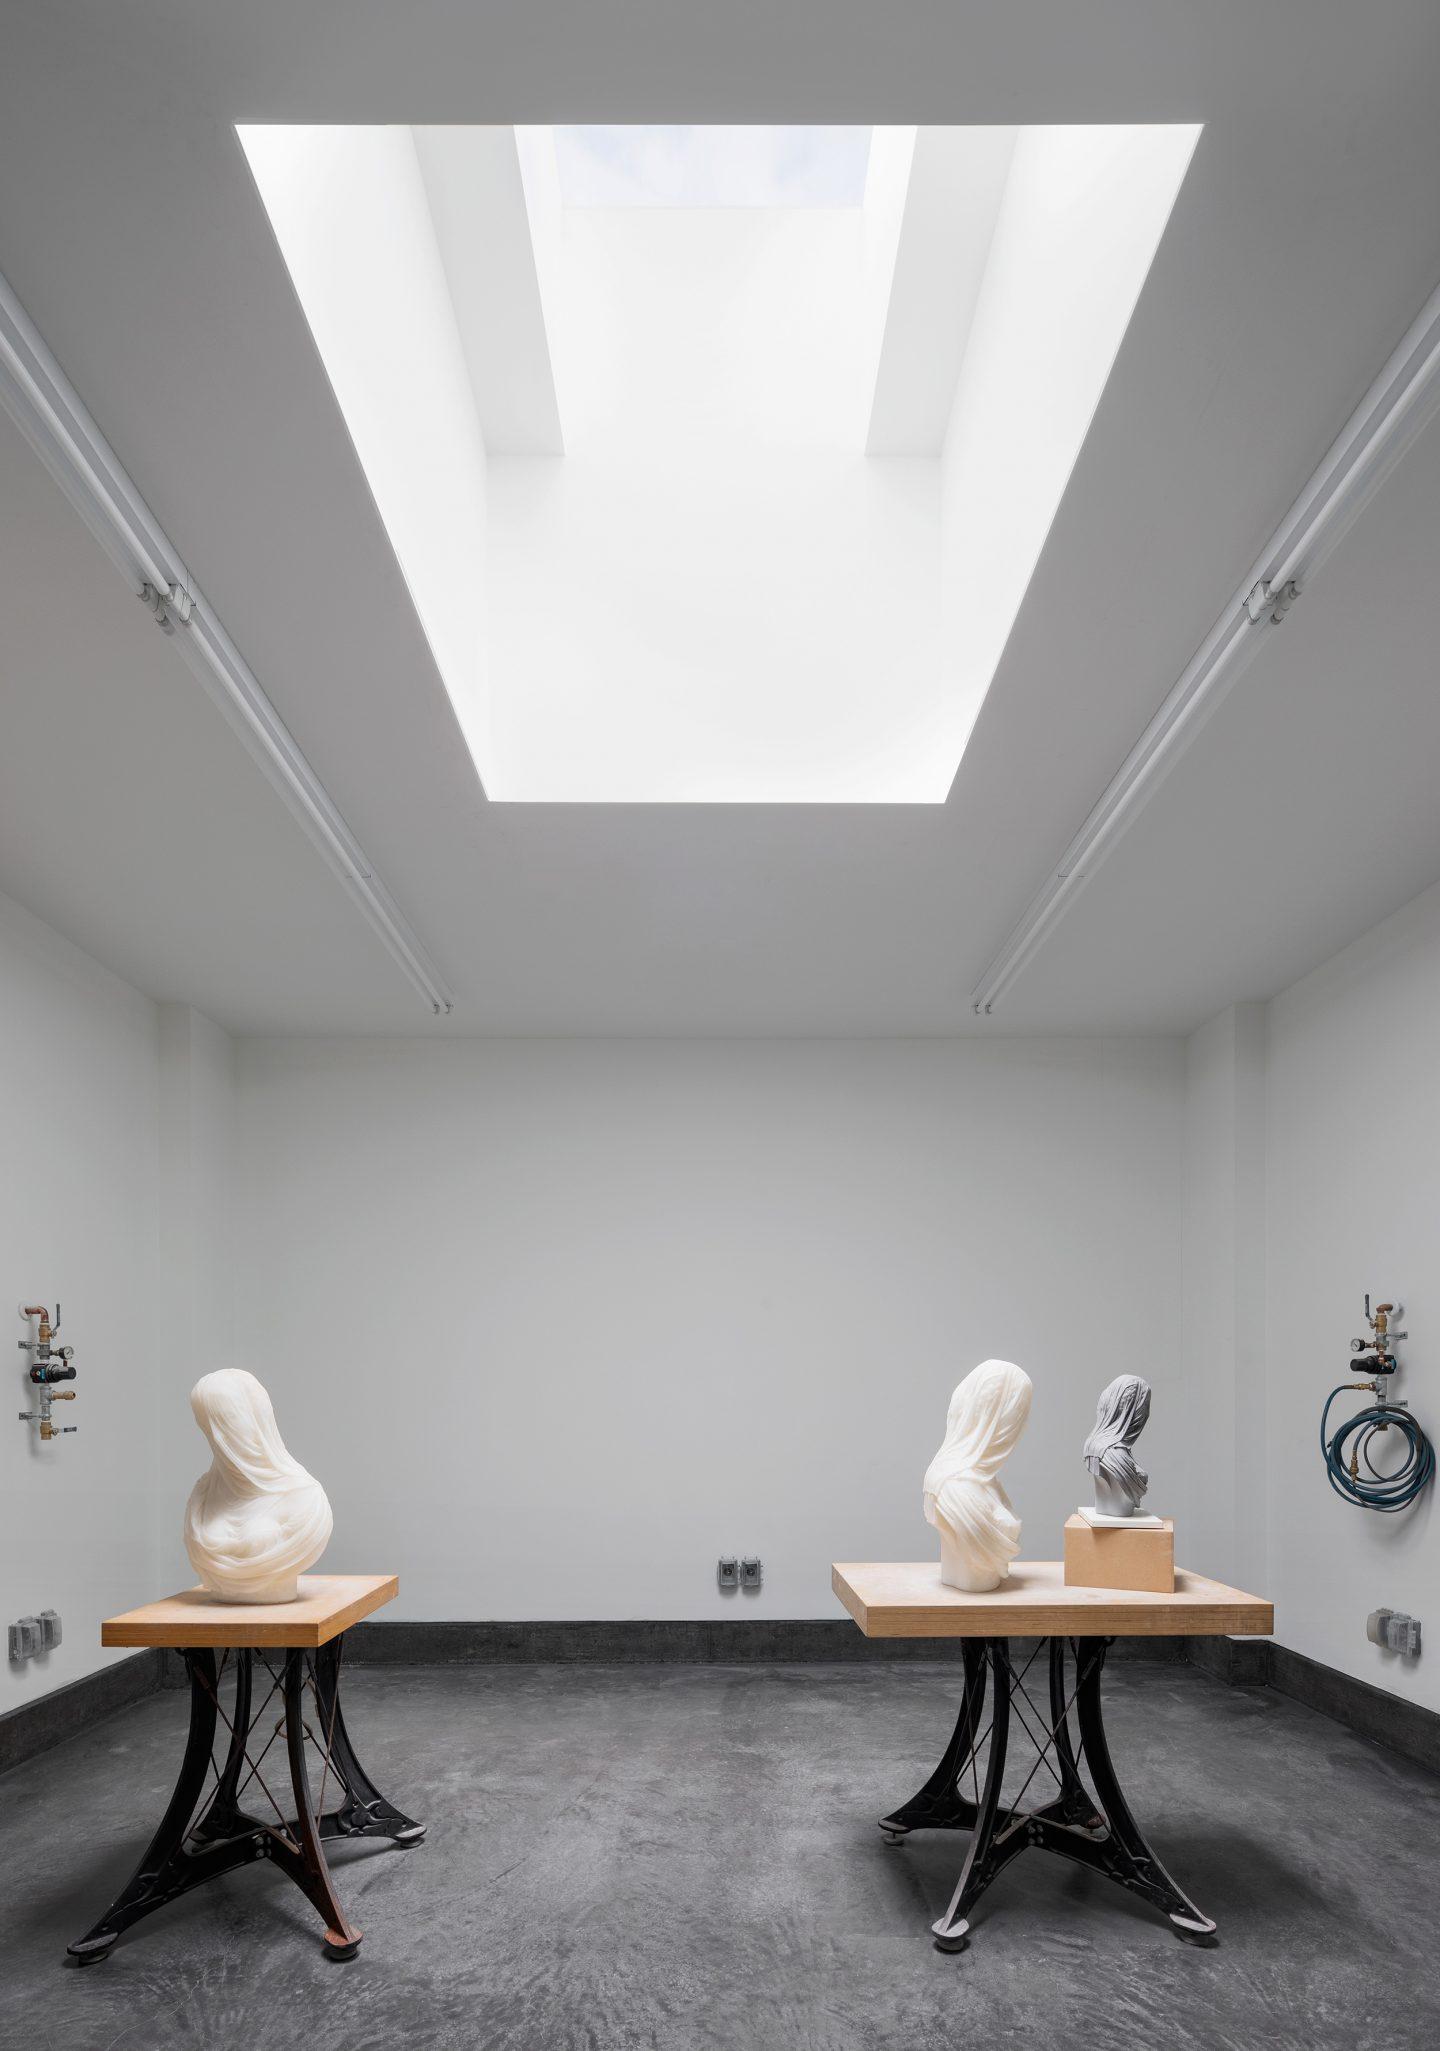 IGNANT-Architecture-Andrew Berman Architect-5